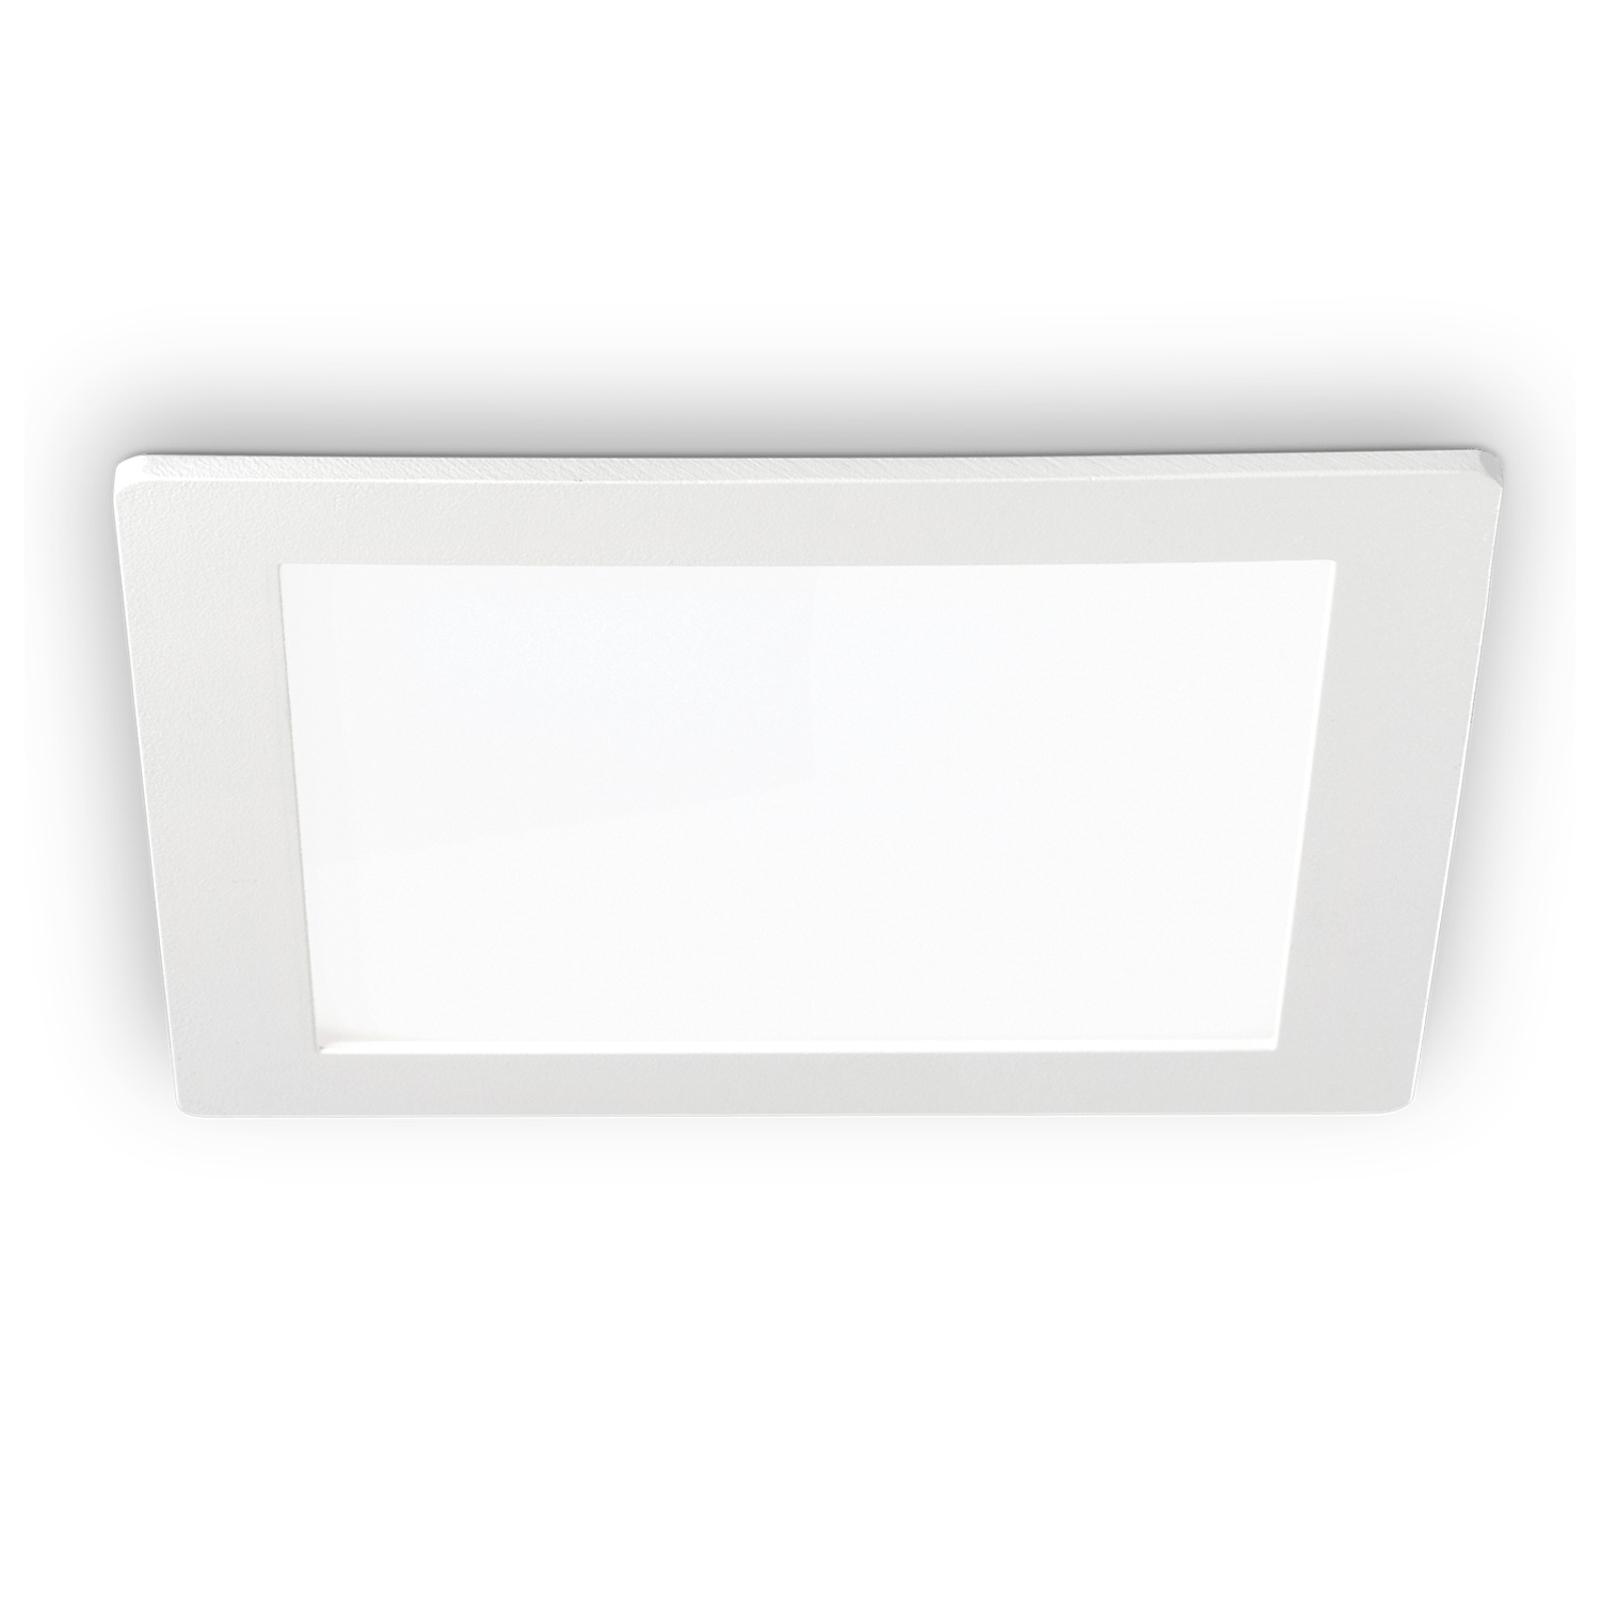 LED-Deckeneinbauleuchte Groove square 22,7x22,7 cm